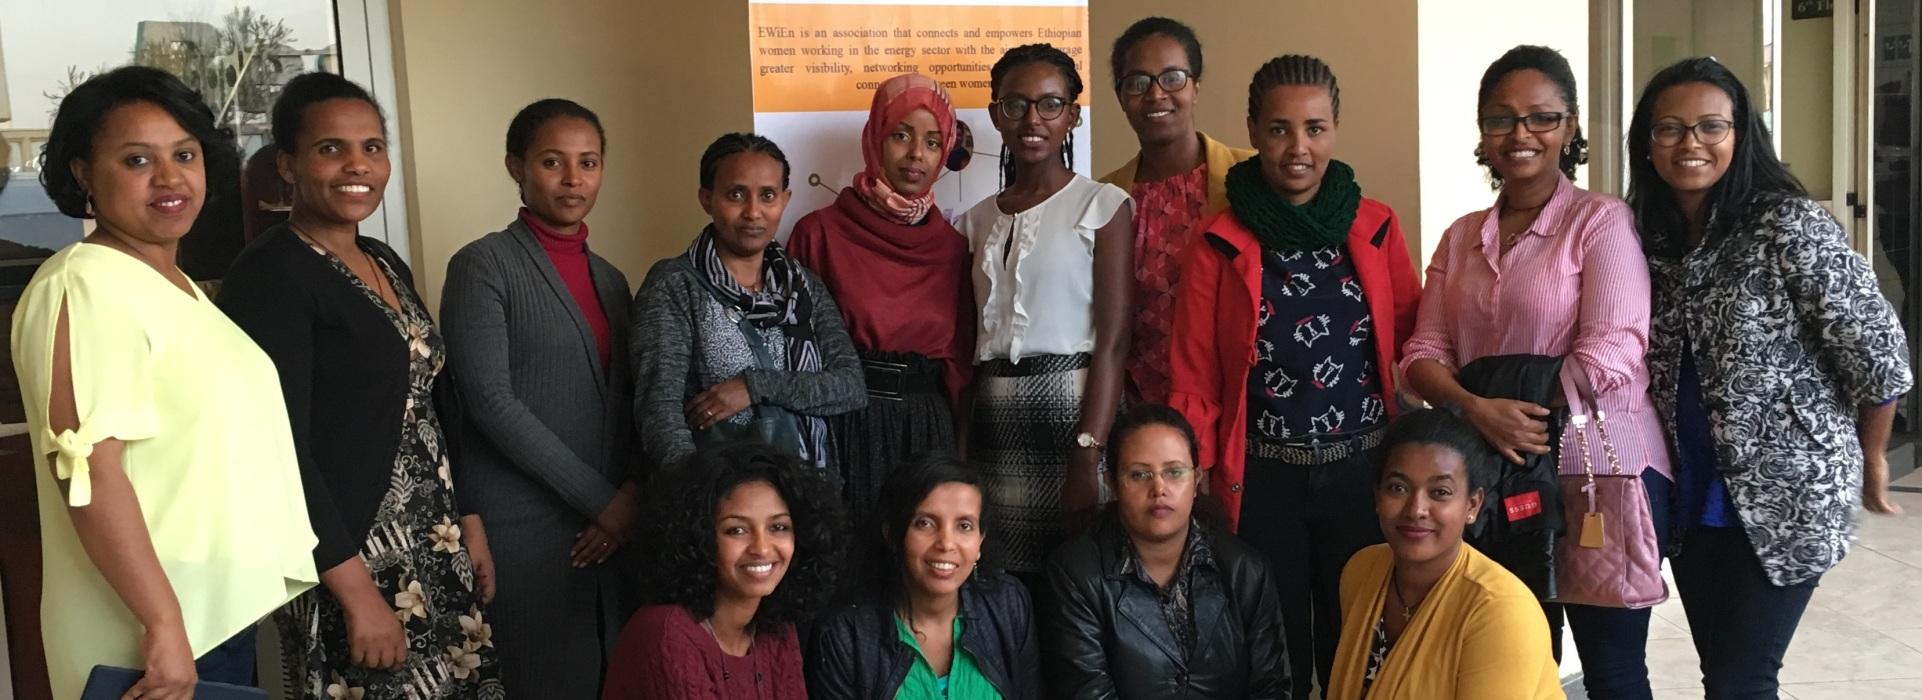 Ethiopian Women in Energy